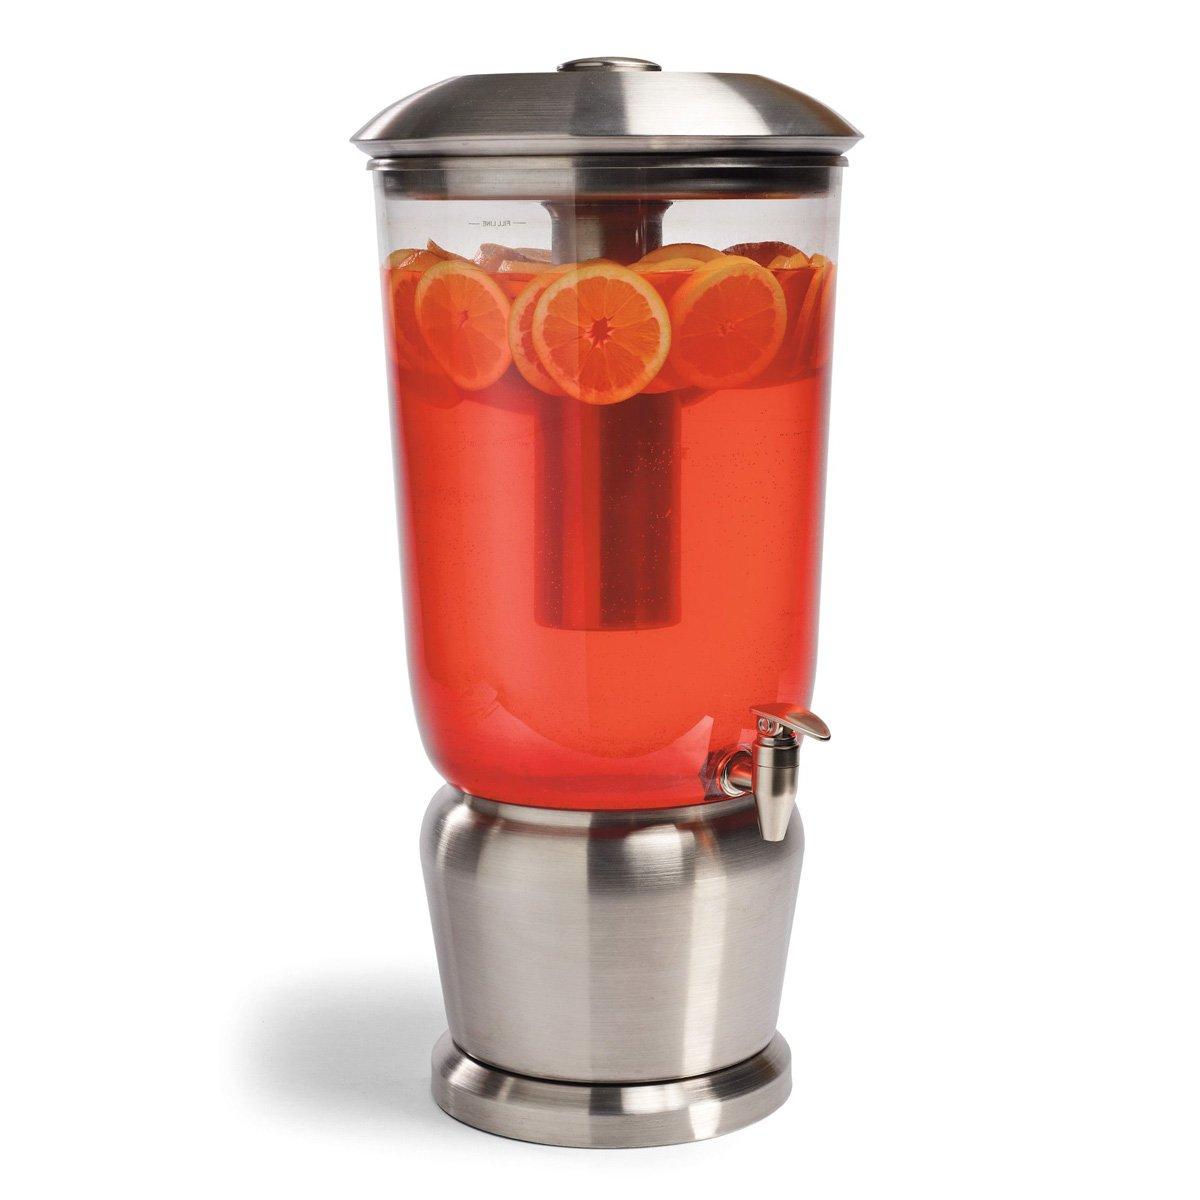 Bpa Free Water Dispenser Durachill Beverage Dispenser - The Green Head